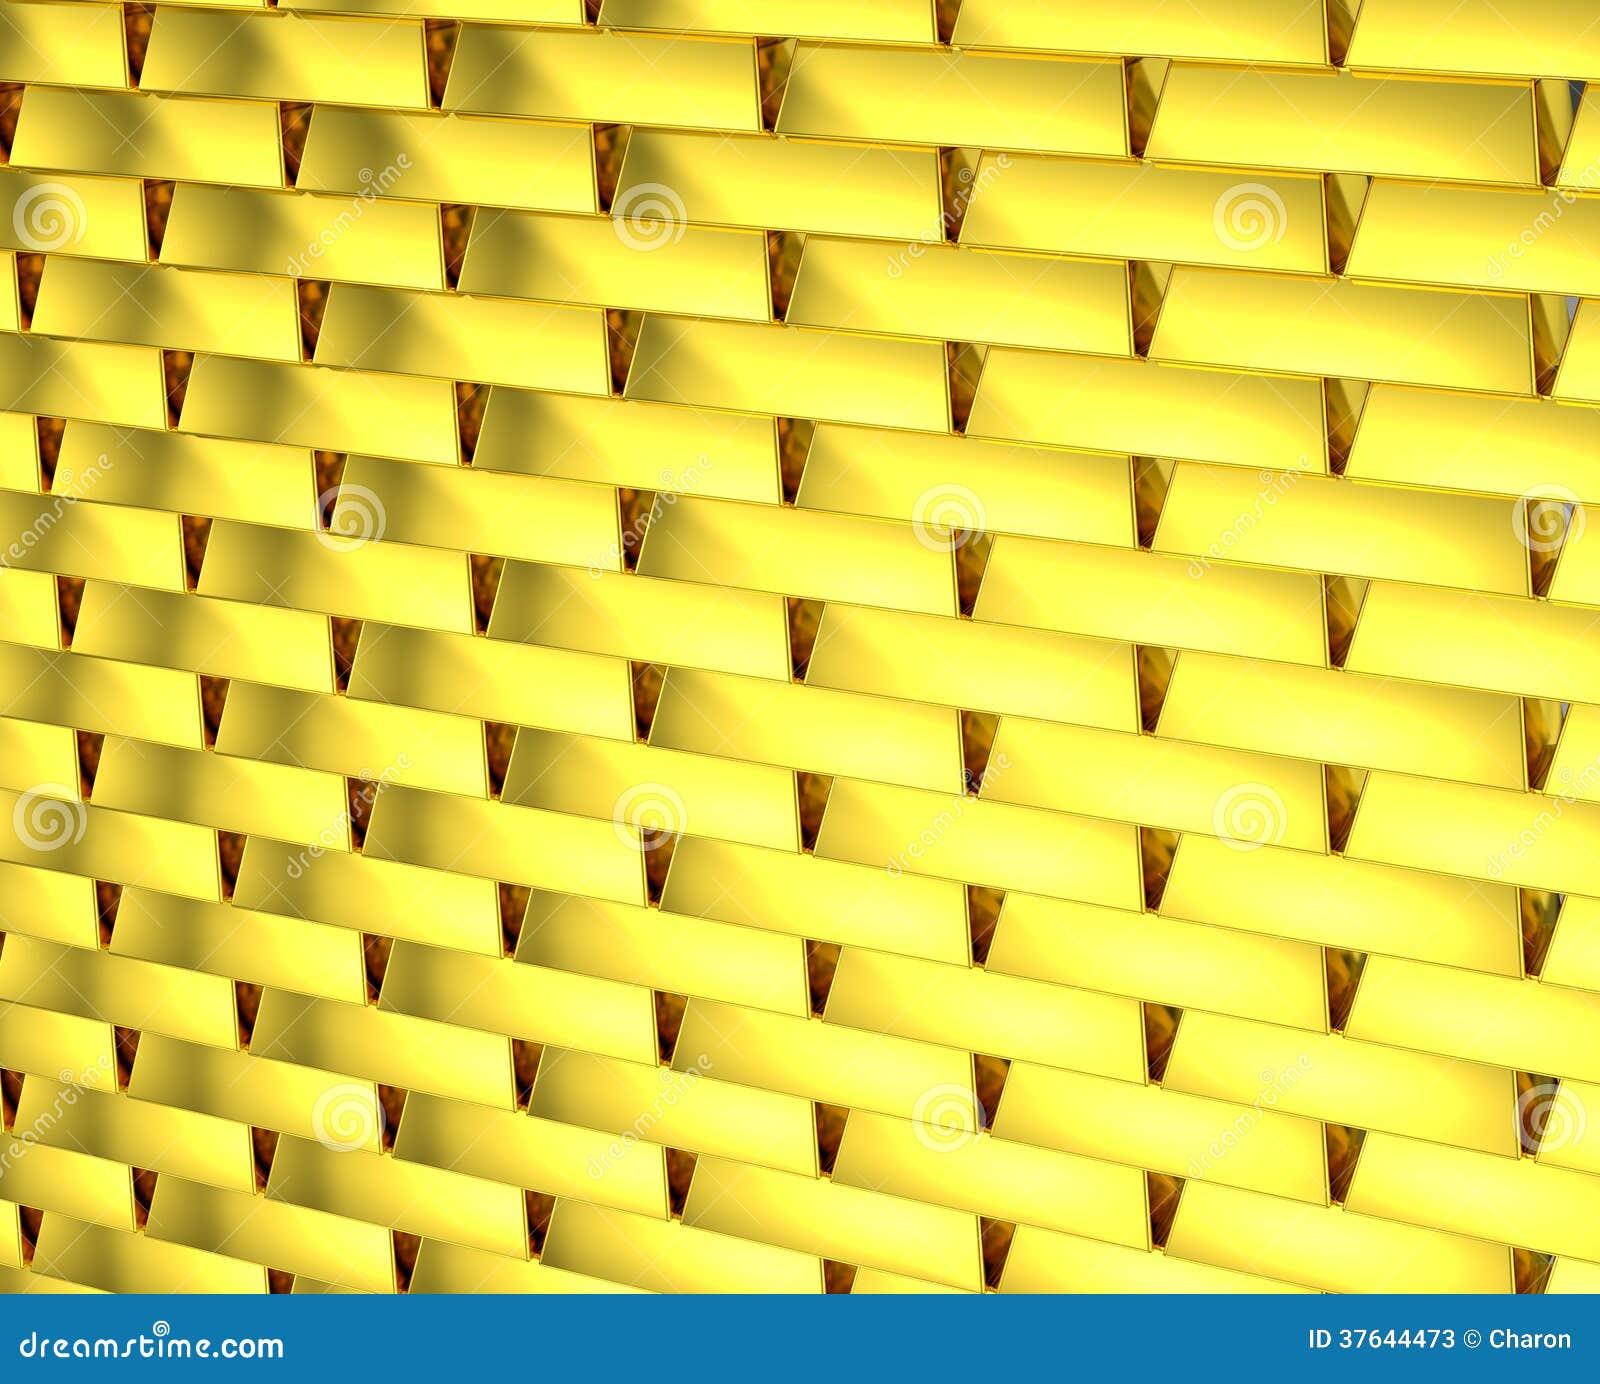 Gold Wall Golden Bricks Endlessly Stock Image